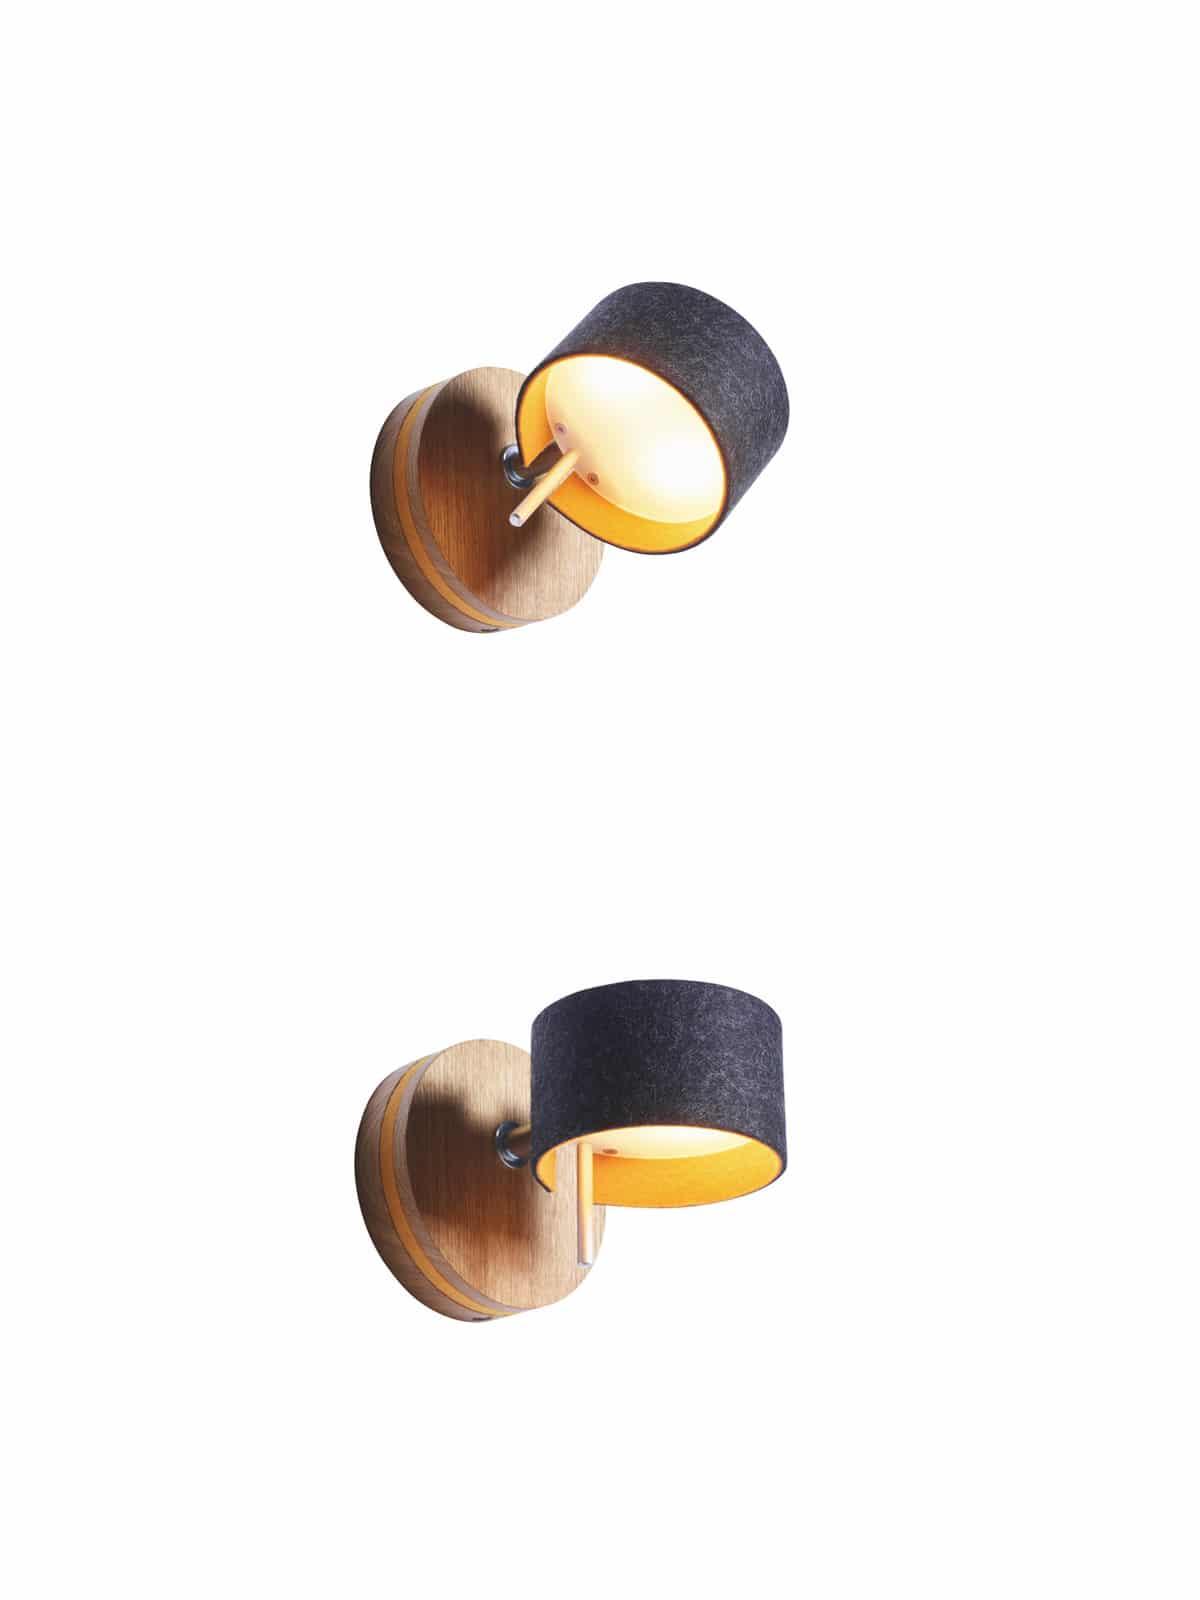 Domus Frits Wandleuchte LED Designort Onlineshop